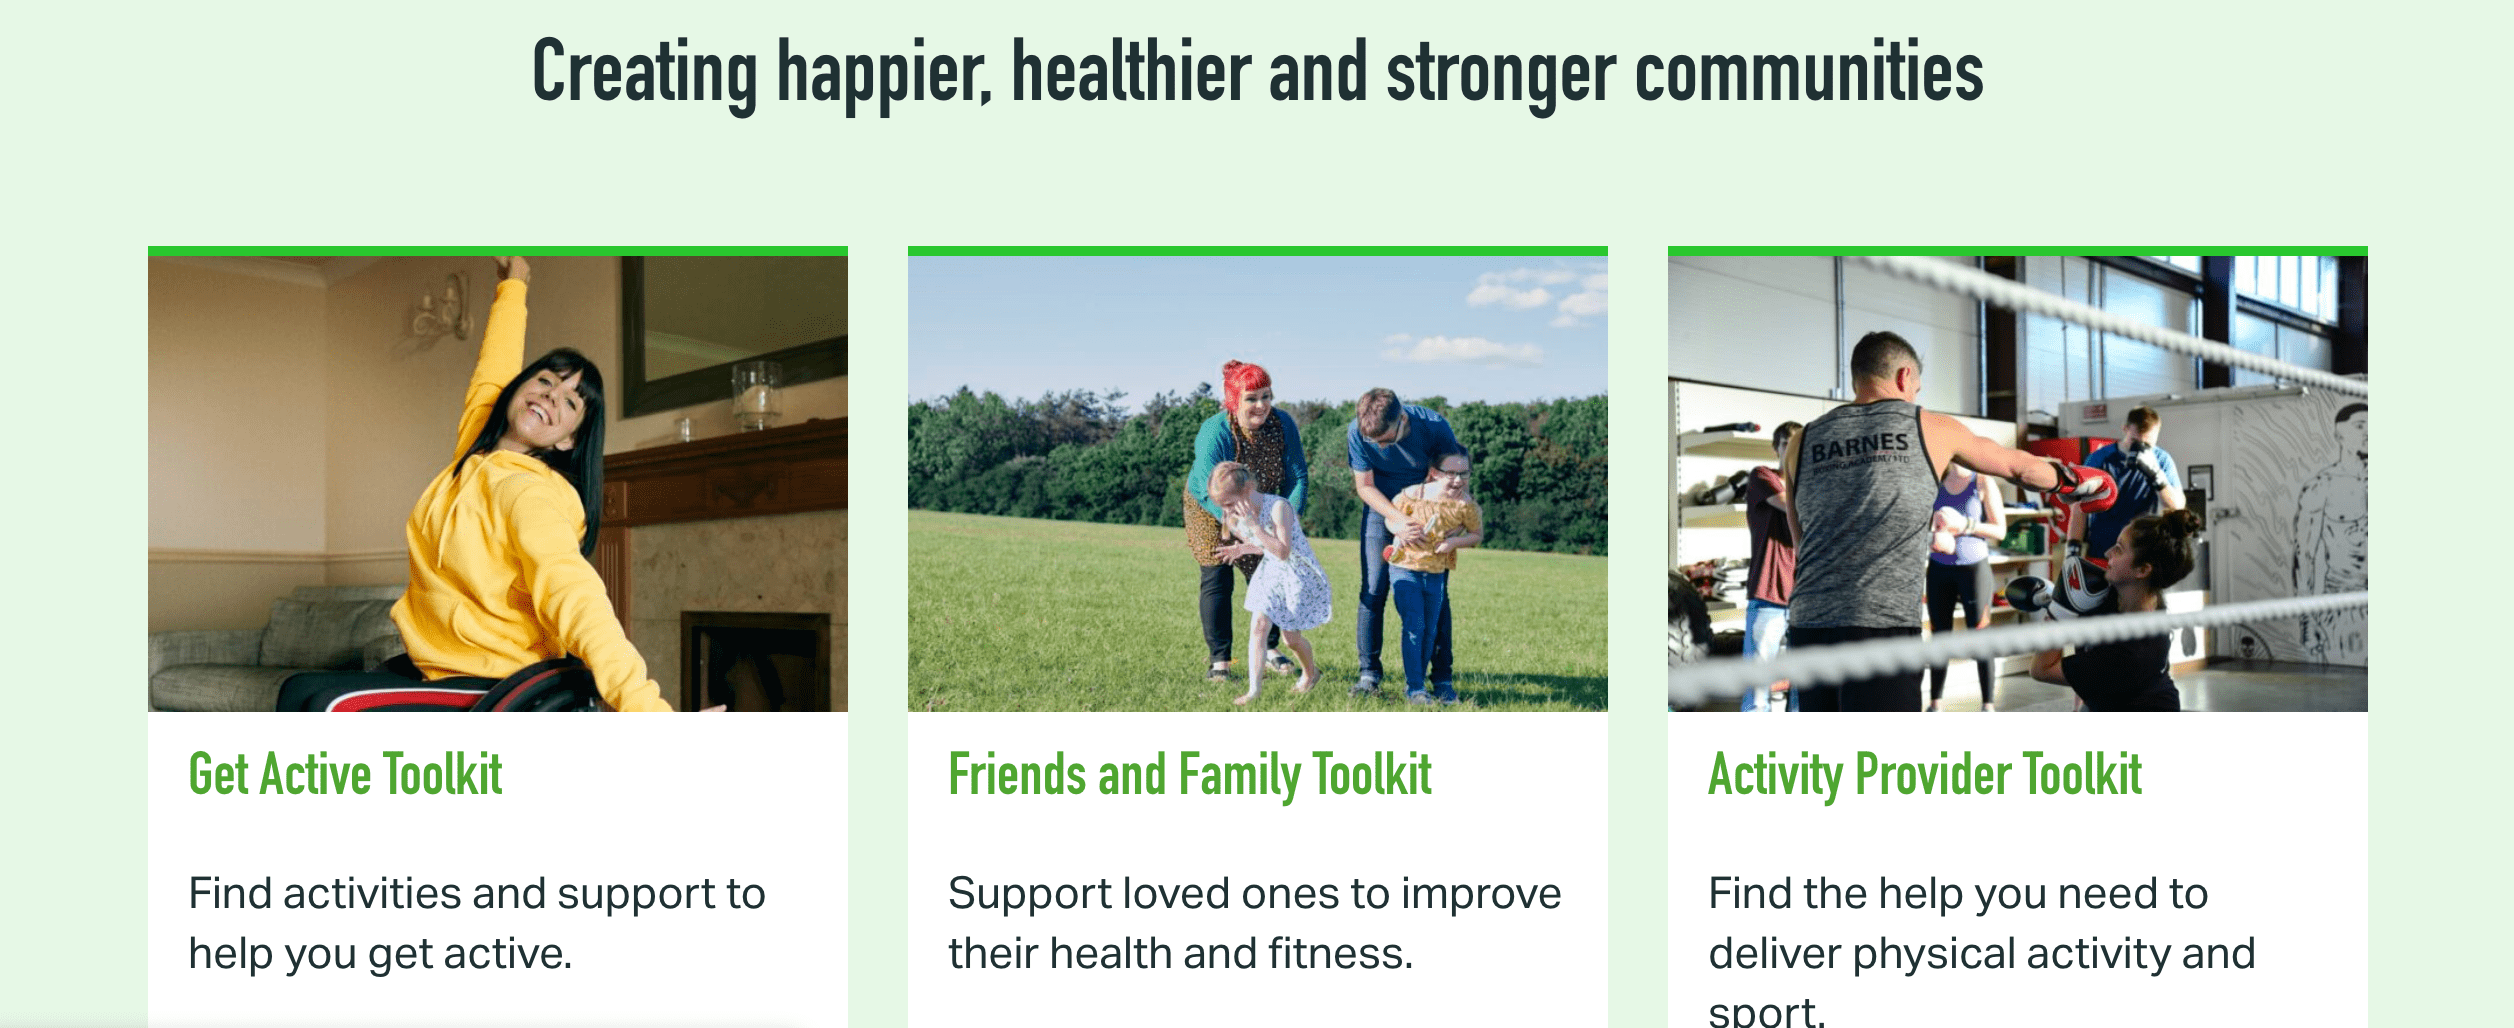 families enjoying being active